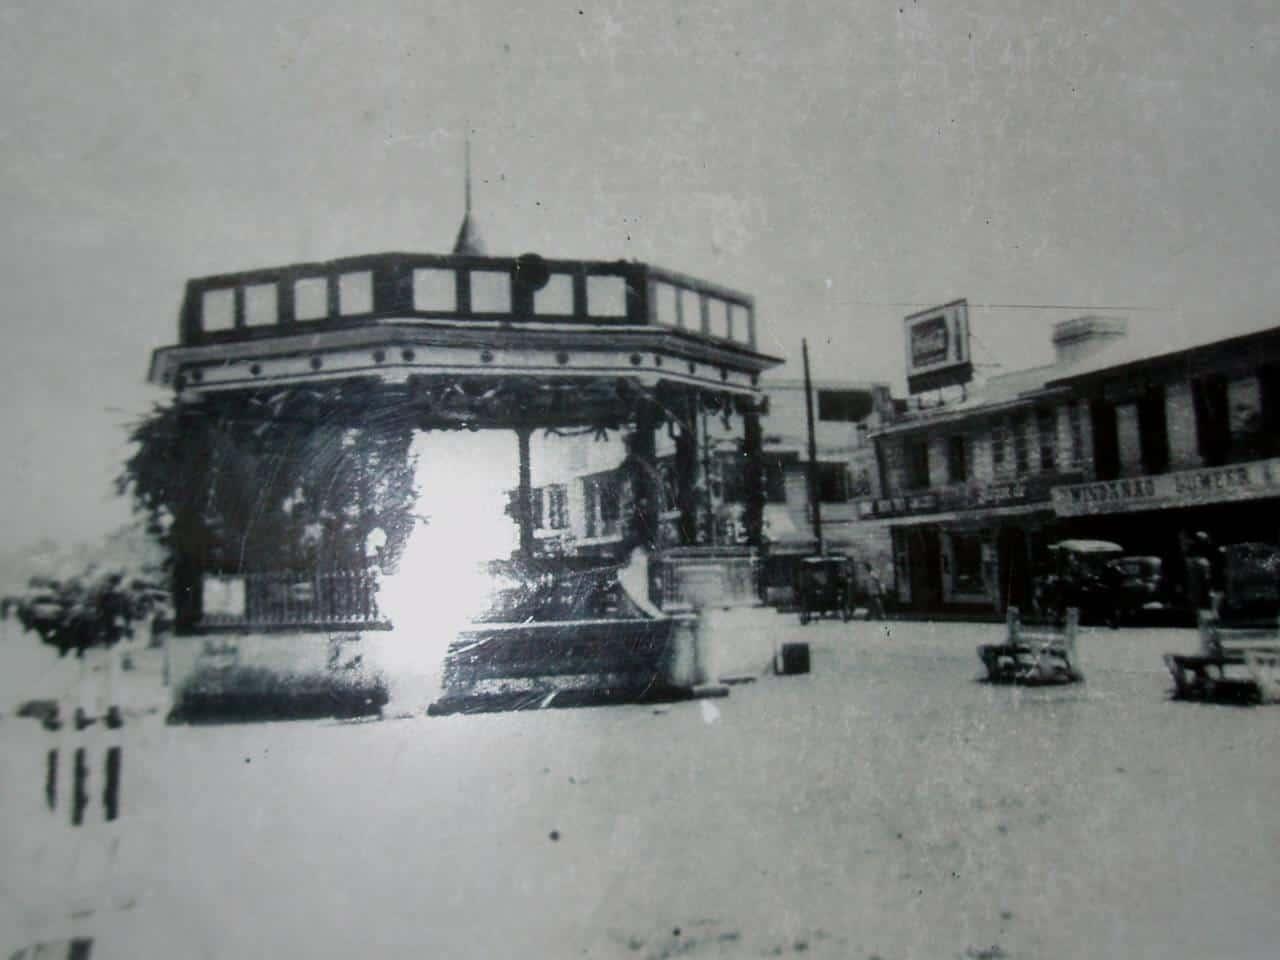 The-old-Kiosko-was-previously-called-the-Tribuna